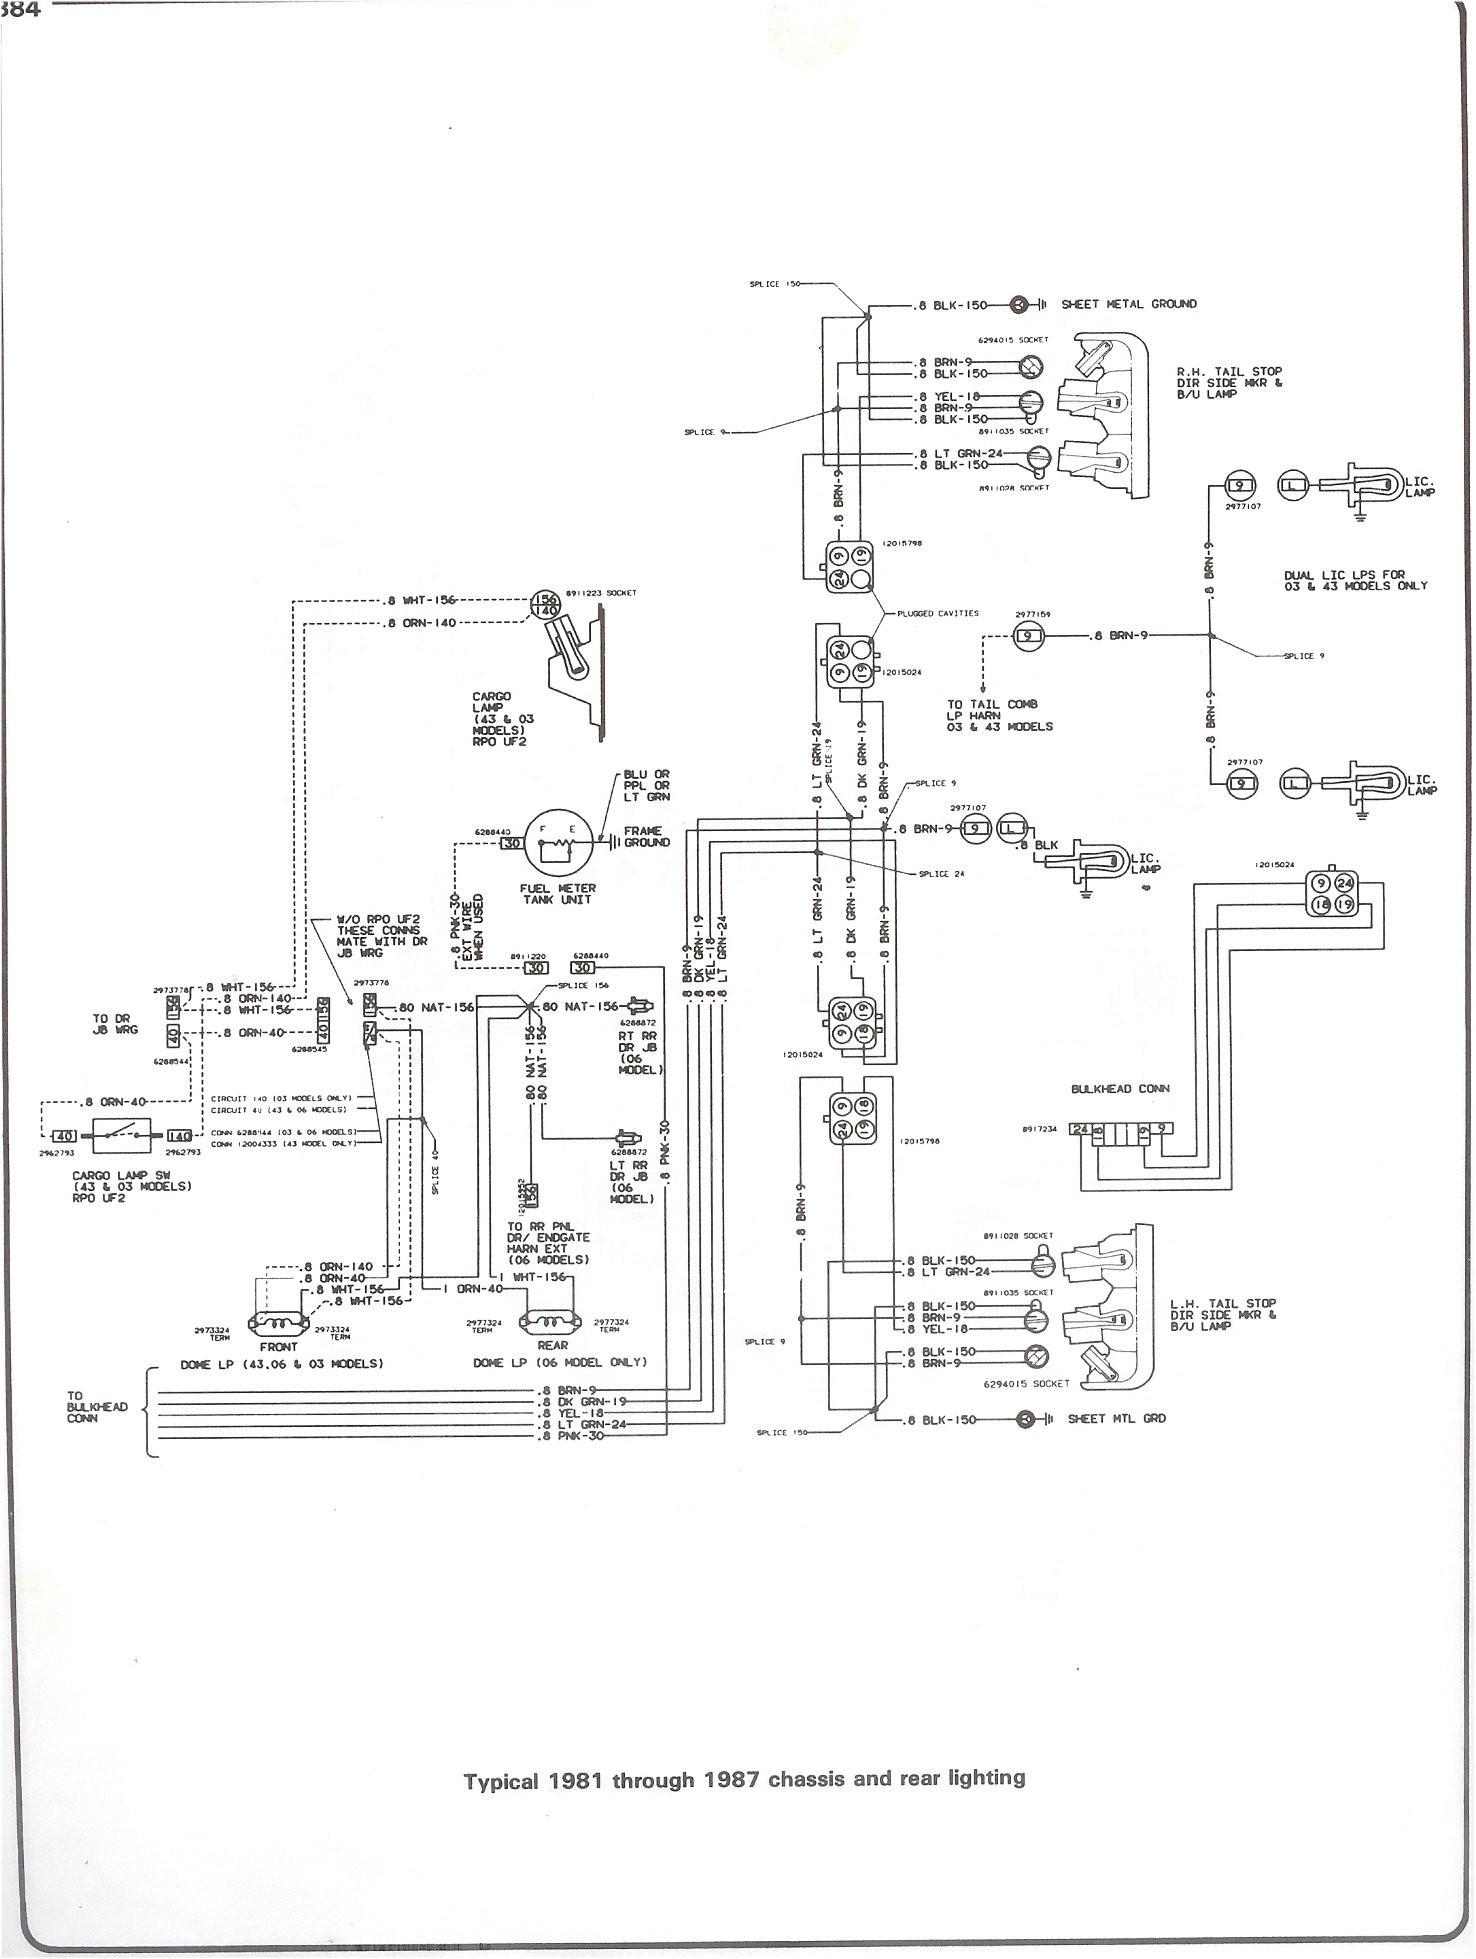 1987 chevy truck vacuum line diagram 76 chevy truck wiring diagram wiring data of 1987 chevy